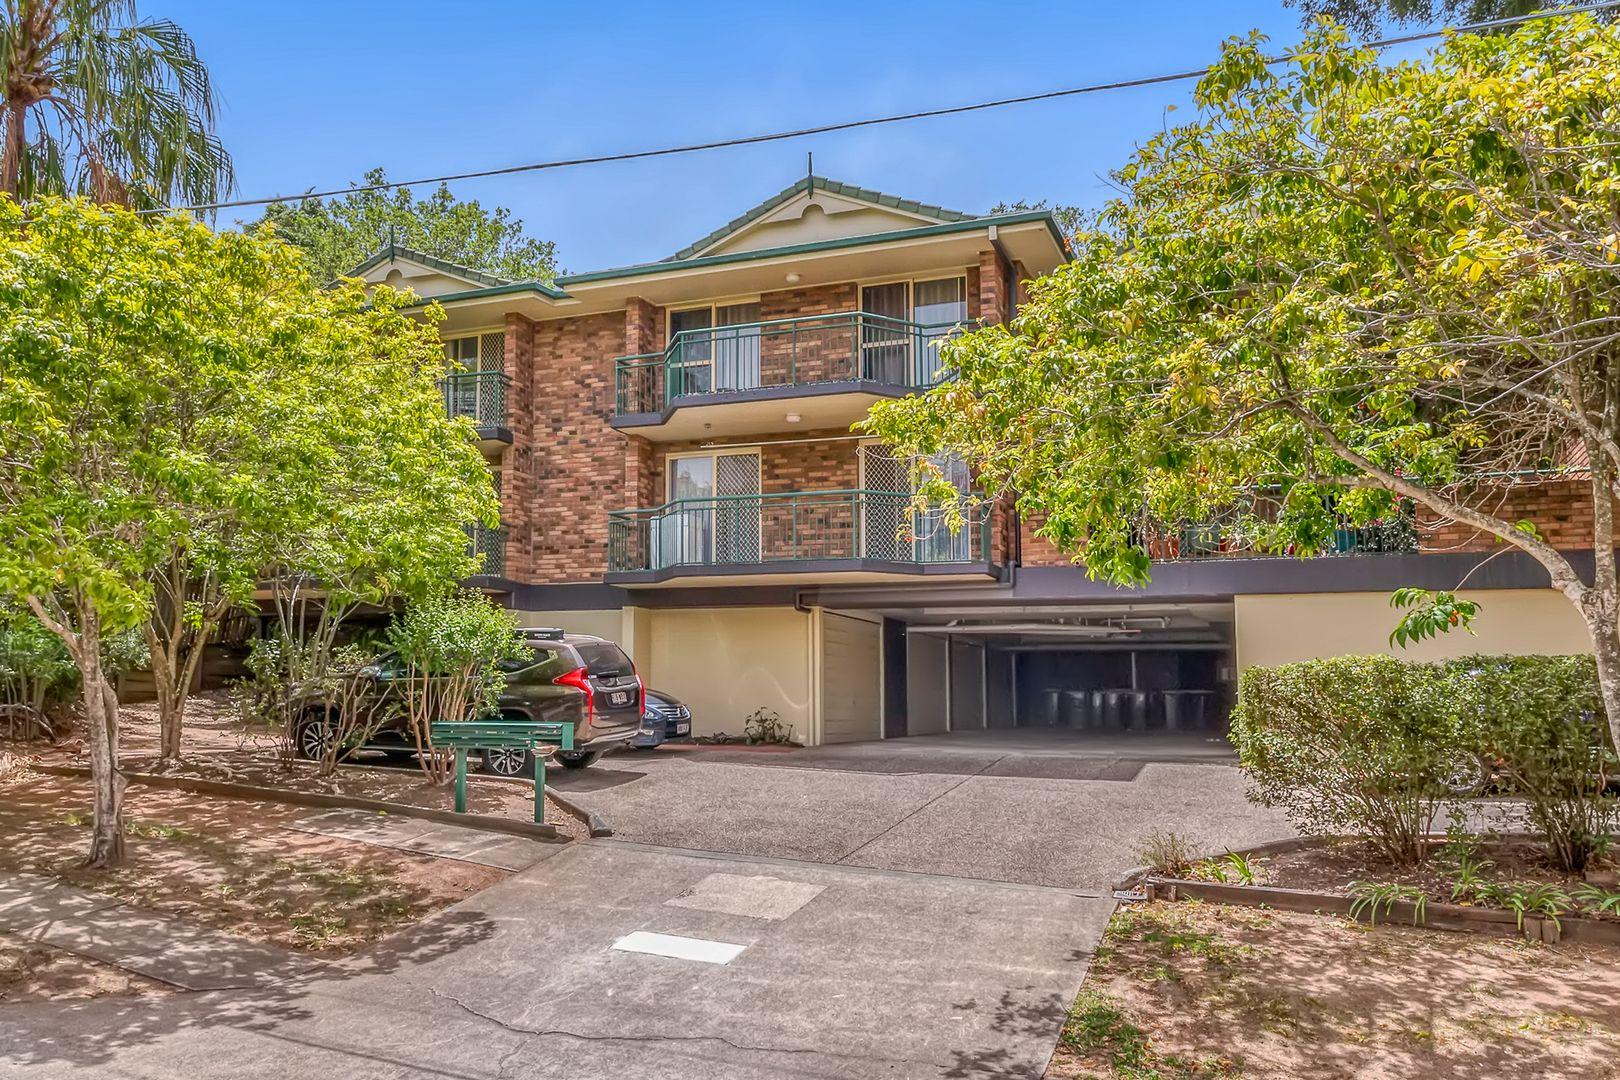 1/24 Depper Street, St Lucia QLD 4067, Image 0